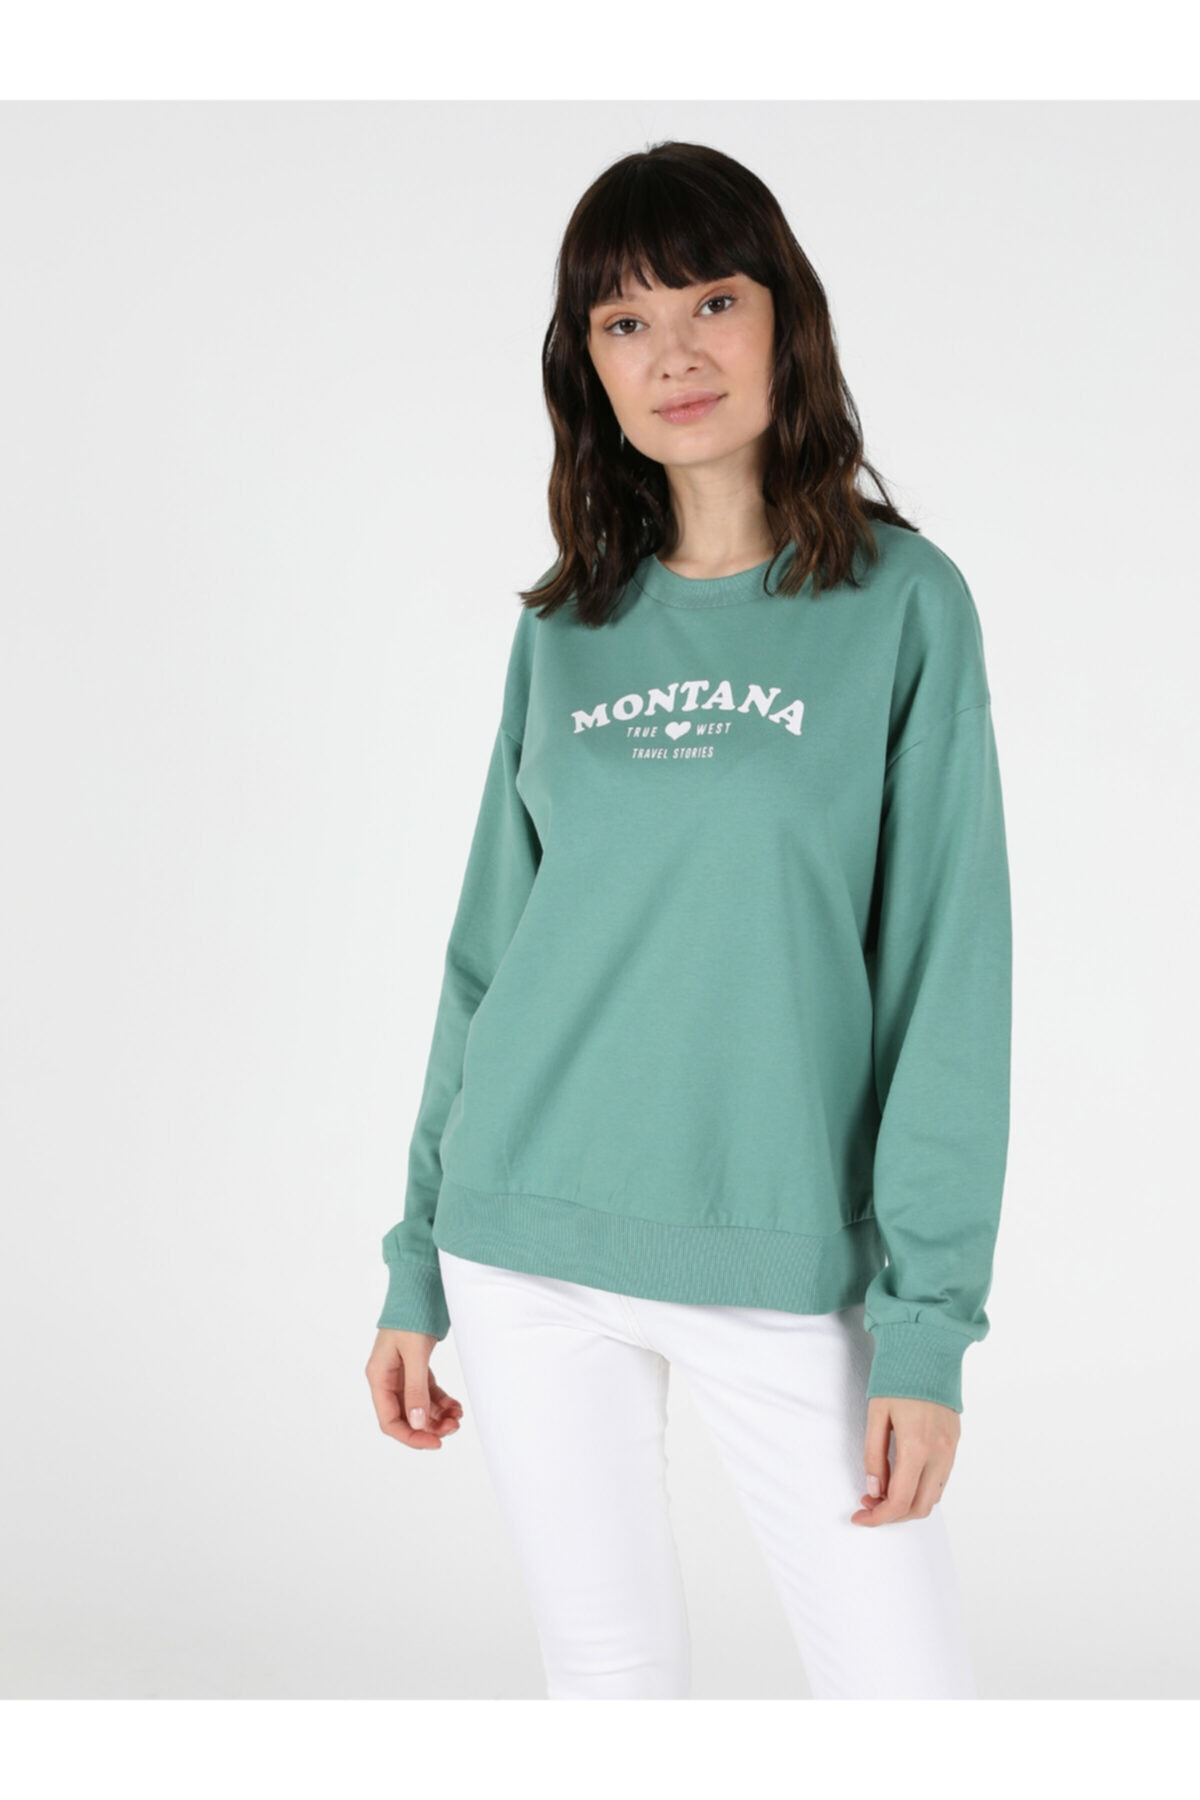 KADIN Regular Fitkadın Sweatshirt CL1051010